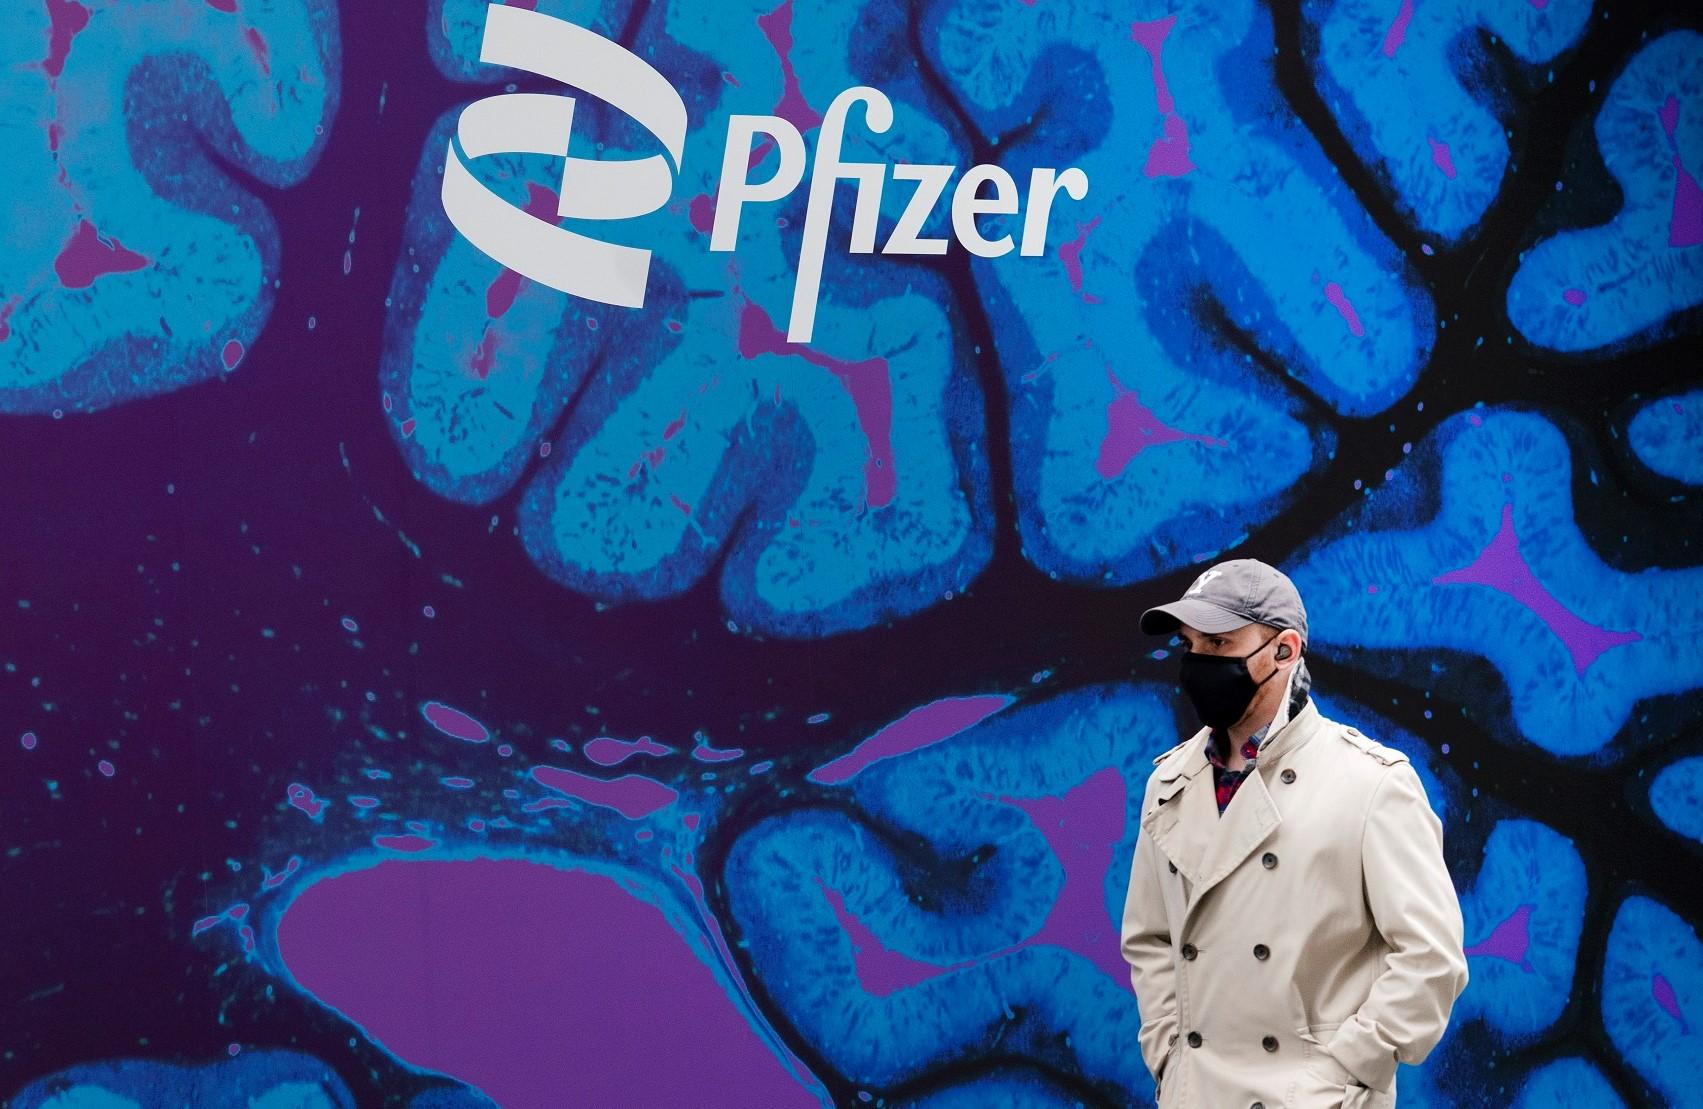 Eμβόλιο Pfizer: 90% αποτελεσματικότητα κατά της νοσηλείας για 6 μήνες